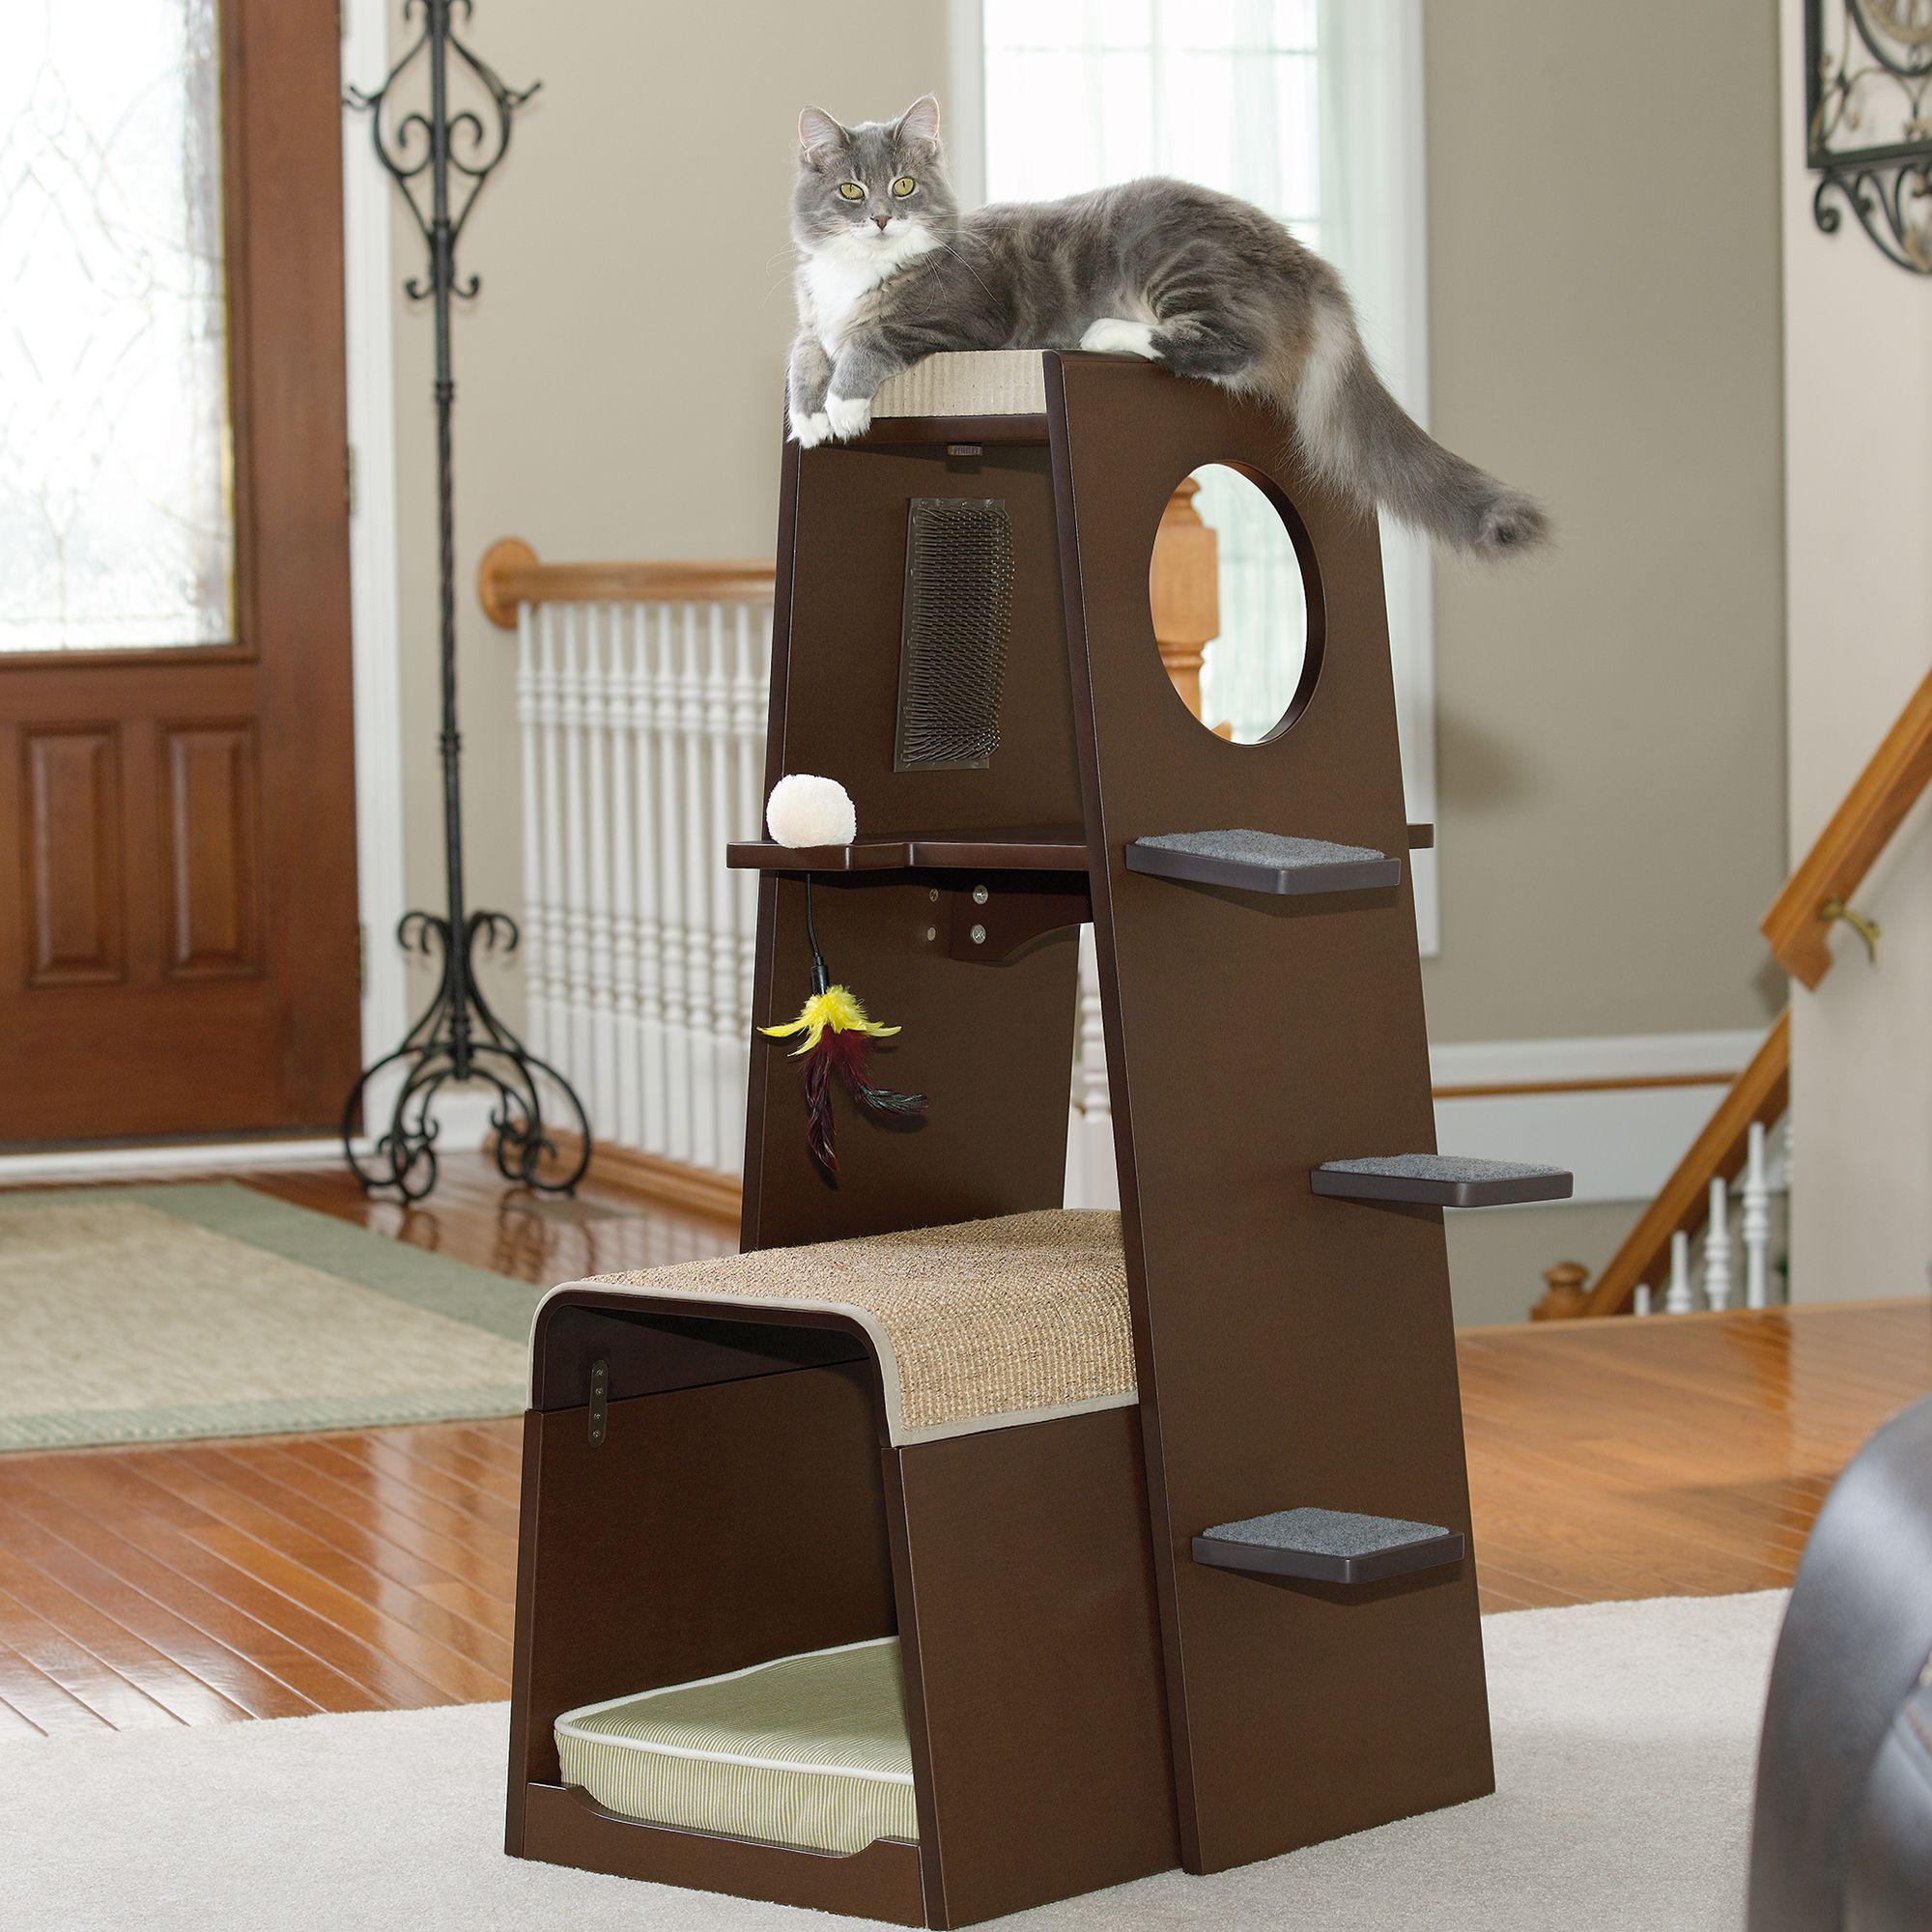 modular modern cat tower – cat furniture  animals  pinterest  - modular modern cat tower – cat furniture